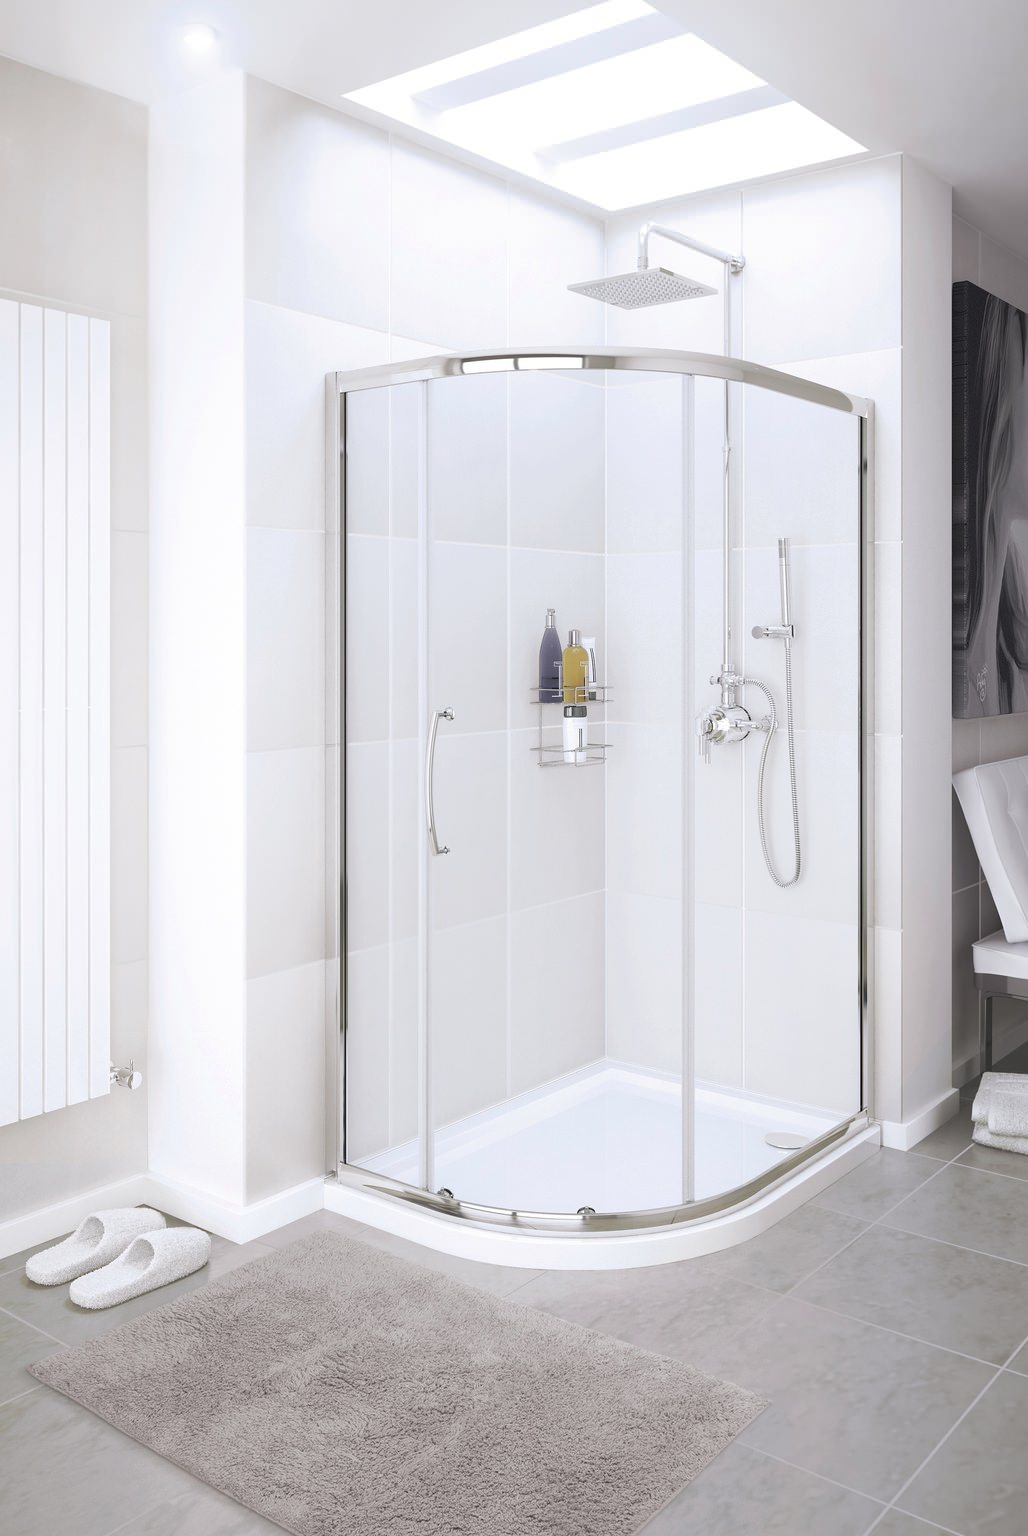 Lakes Classic Silver Single Door Quadrant Shower Enclosure